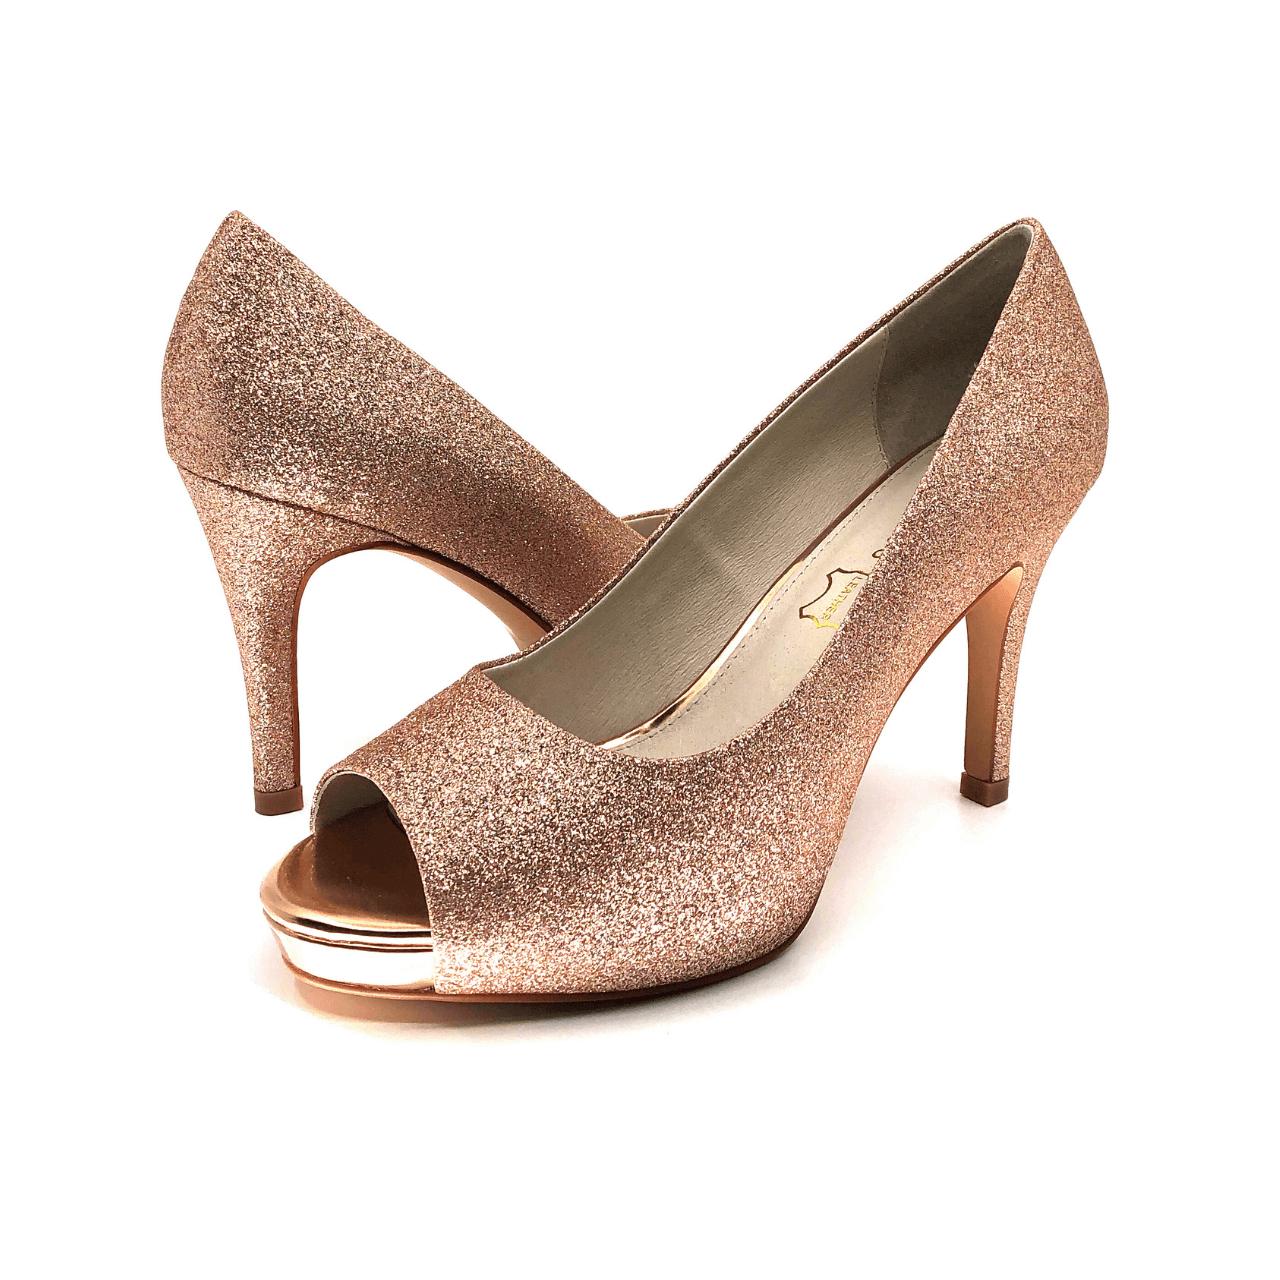 Rose Gold Glitter Peep Toe Mid Heel Pump I Gigi by Scarlettos